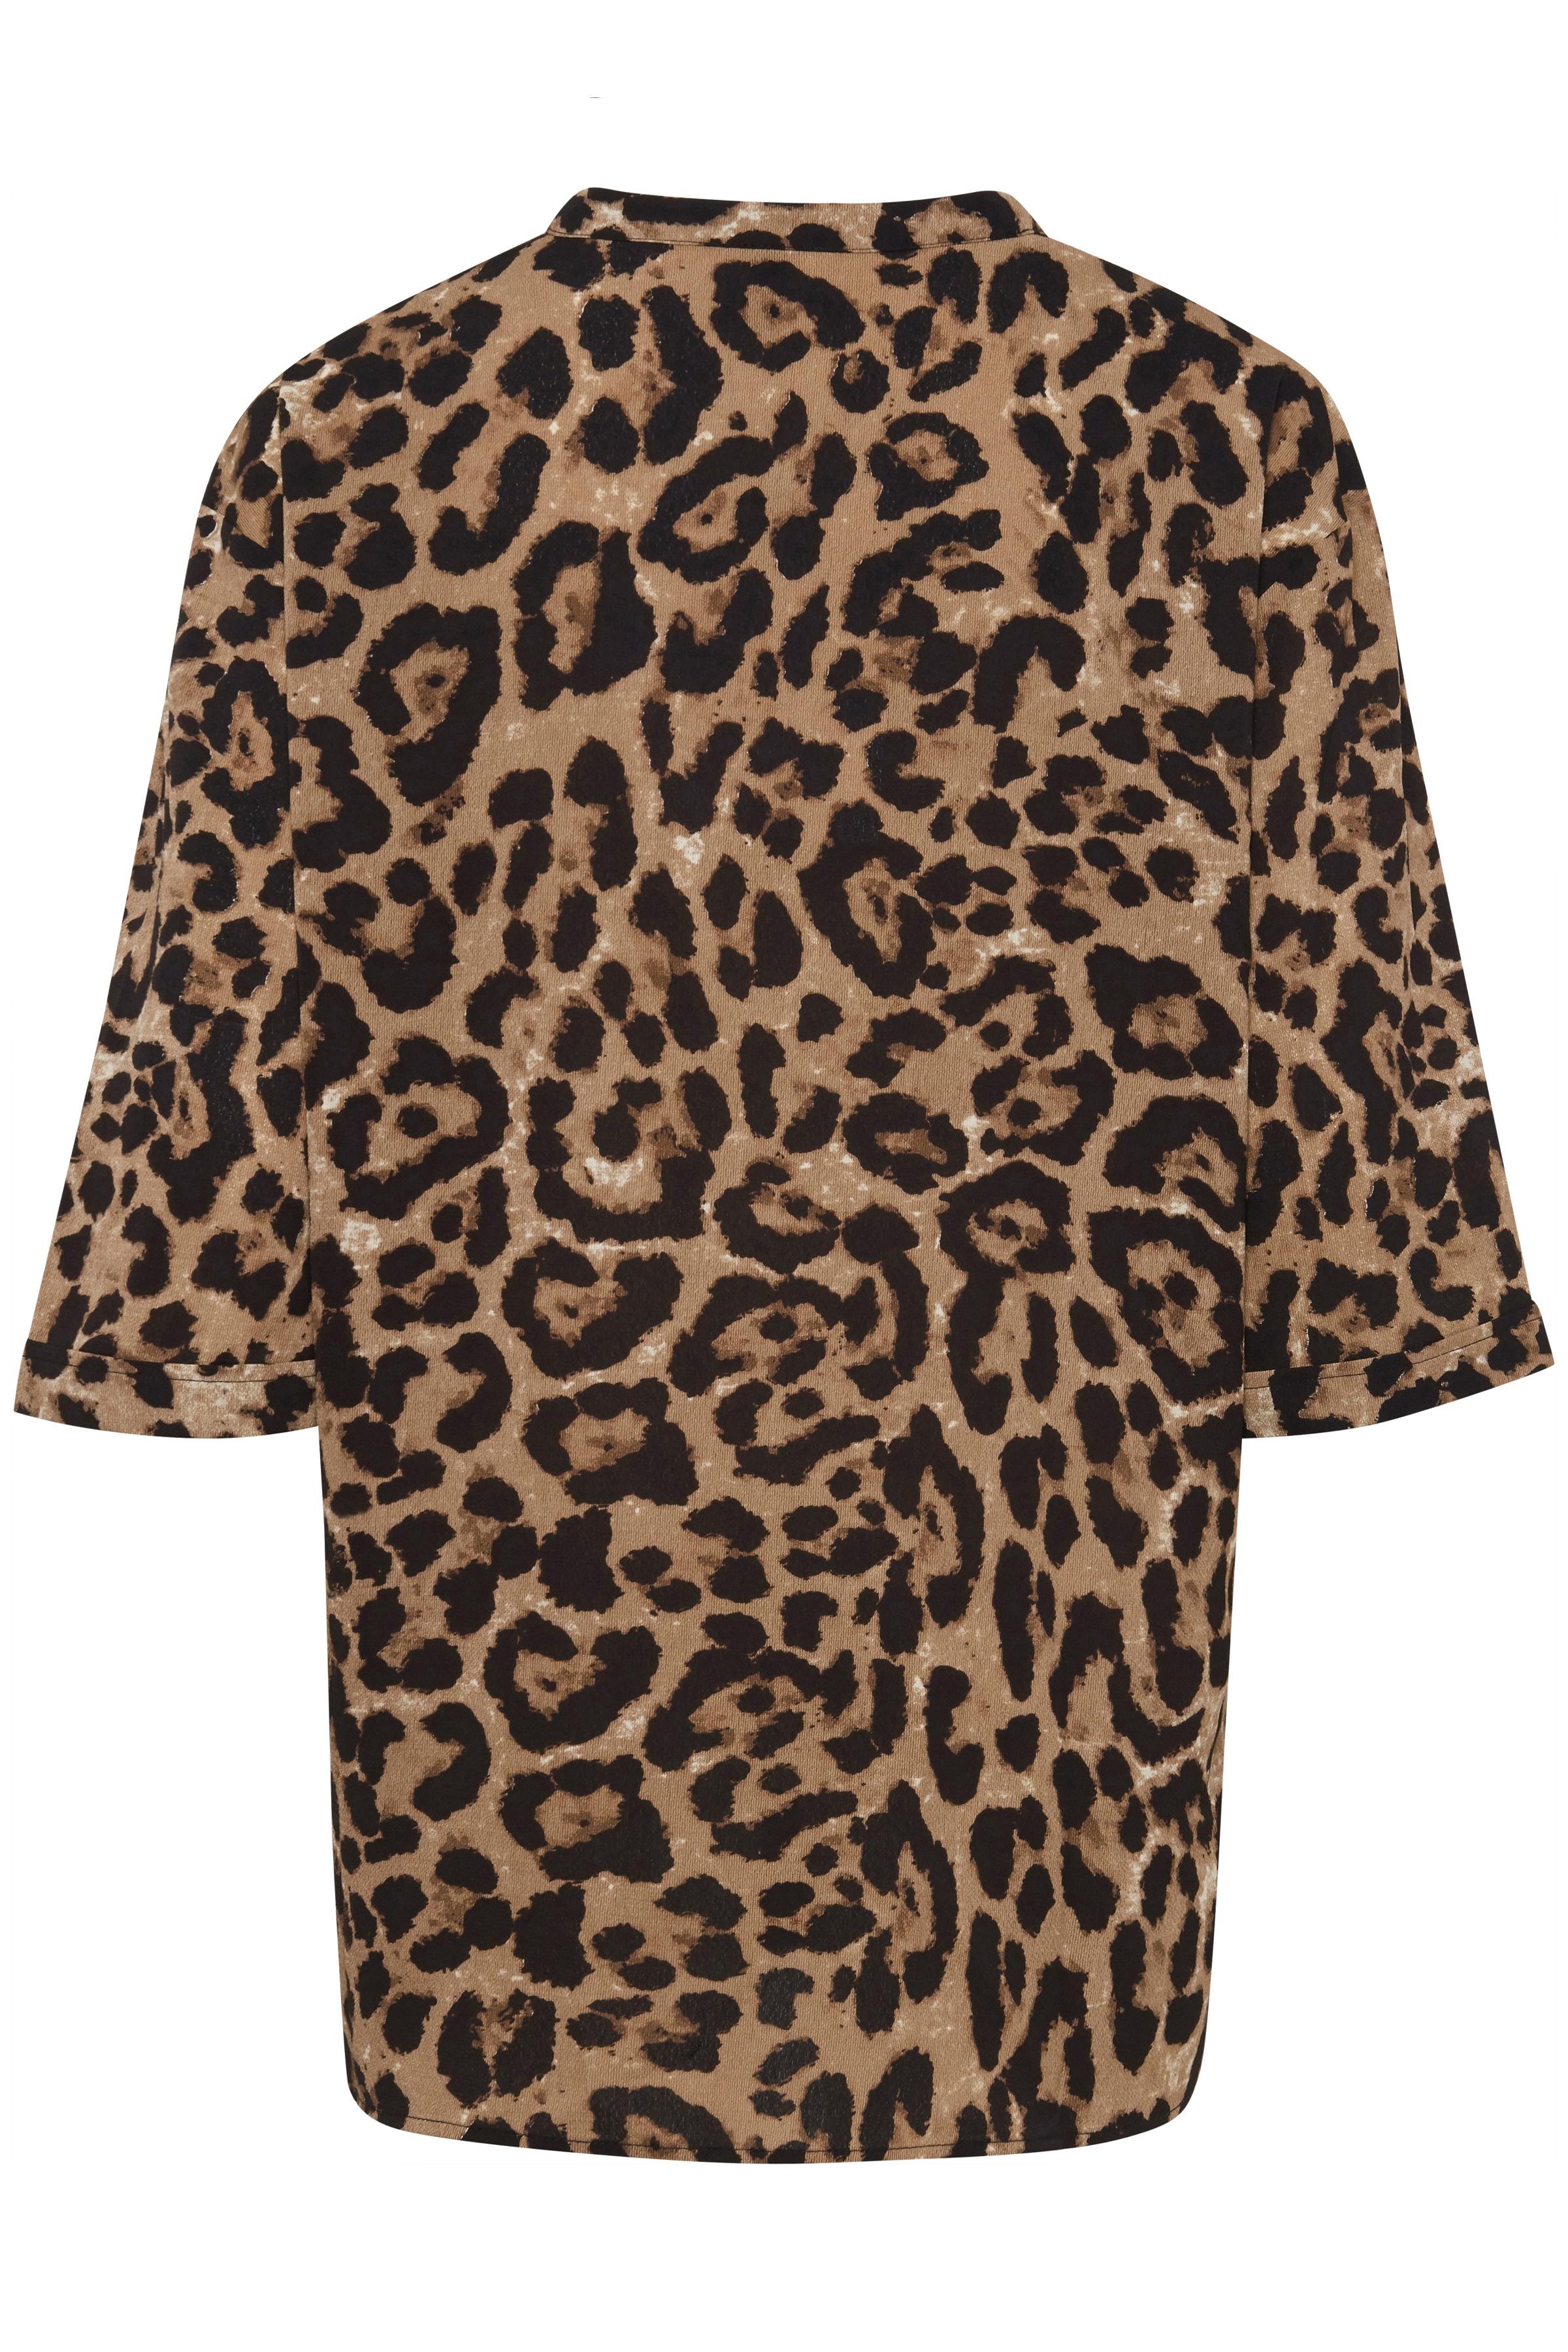 Leopard Sand print Kimono – Køb Leopard Sand print Kimono fra str. XS-XL her